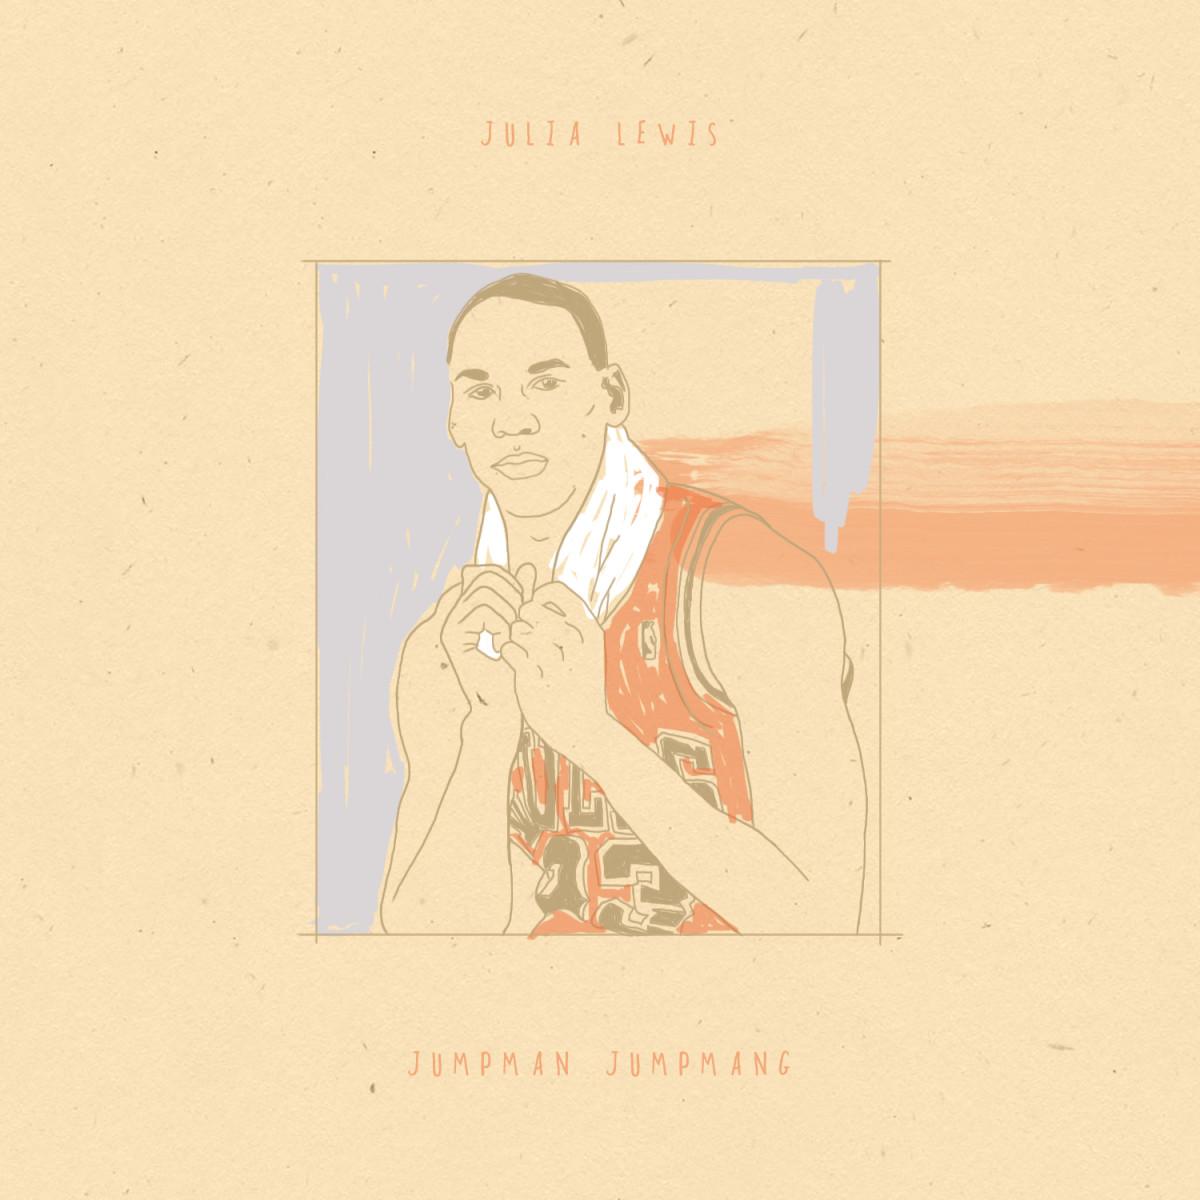 Julia Lewis - Jumpman Jumpmang